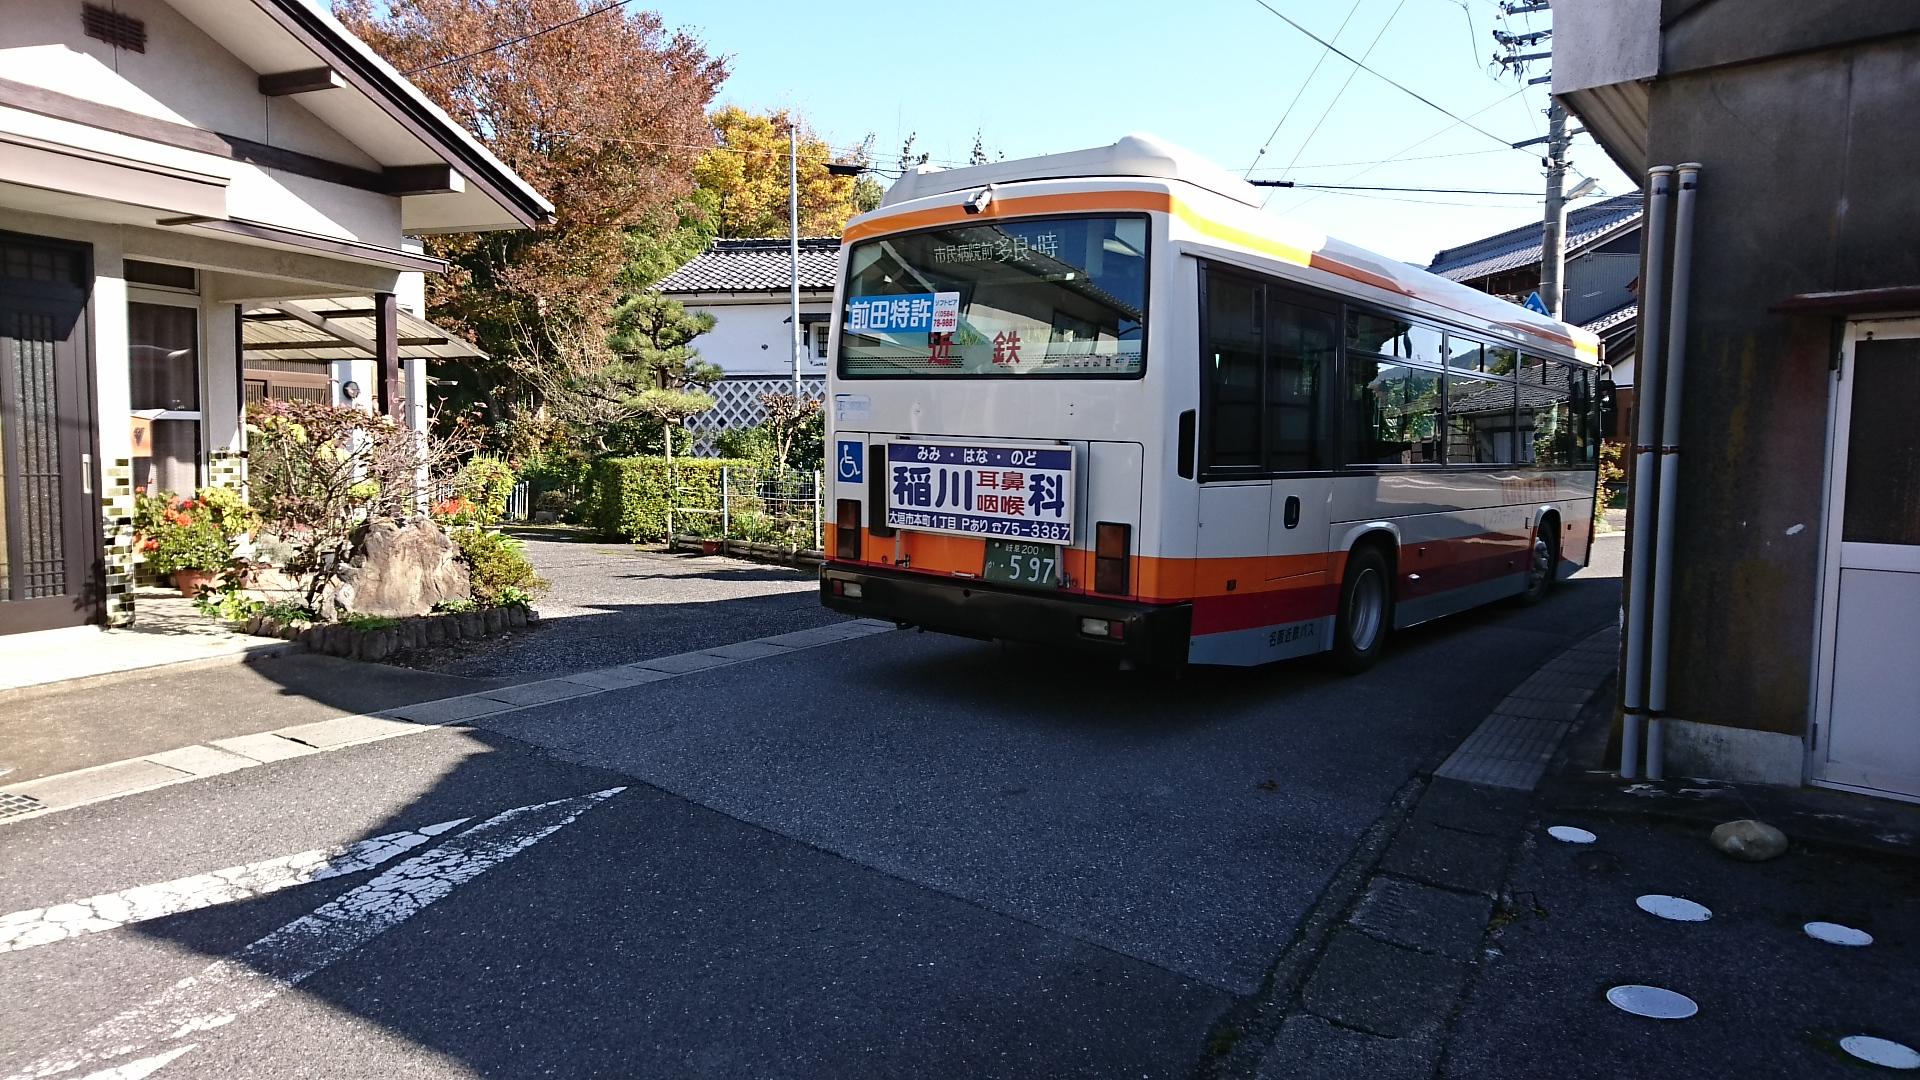 2016.11.16 上石津 (28) 宮 - 名阪近鉄バス